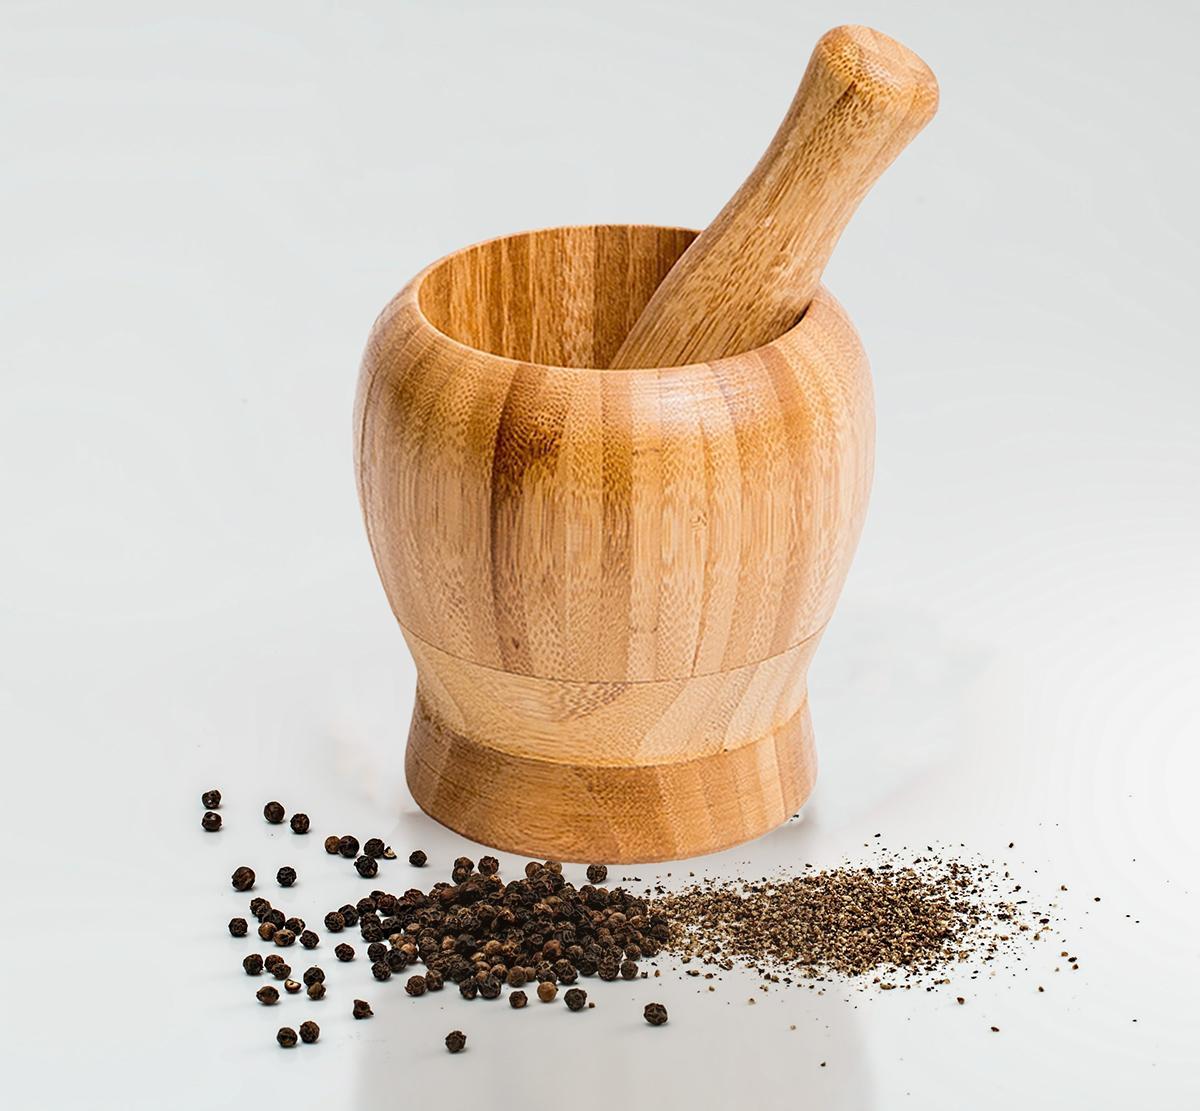 Kit 5 Utensílios/ Pote+ Pilão/ Socador Bambu Ecokitchen Mimo